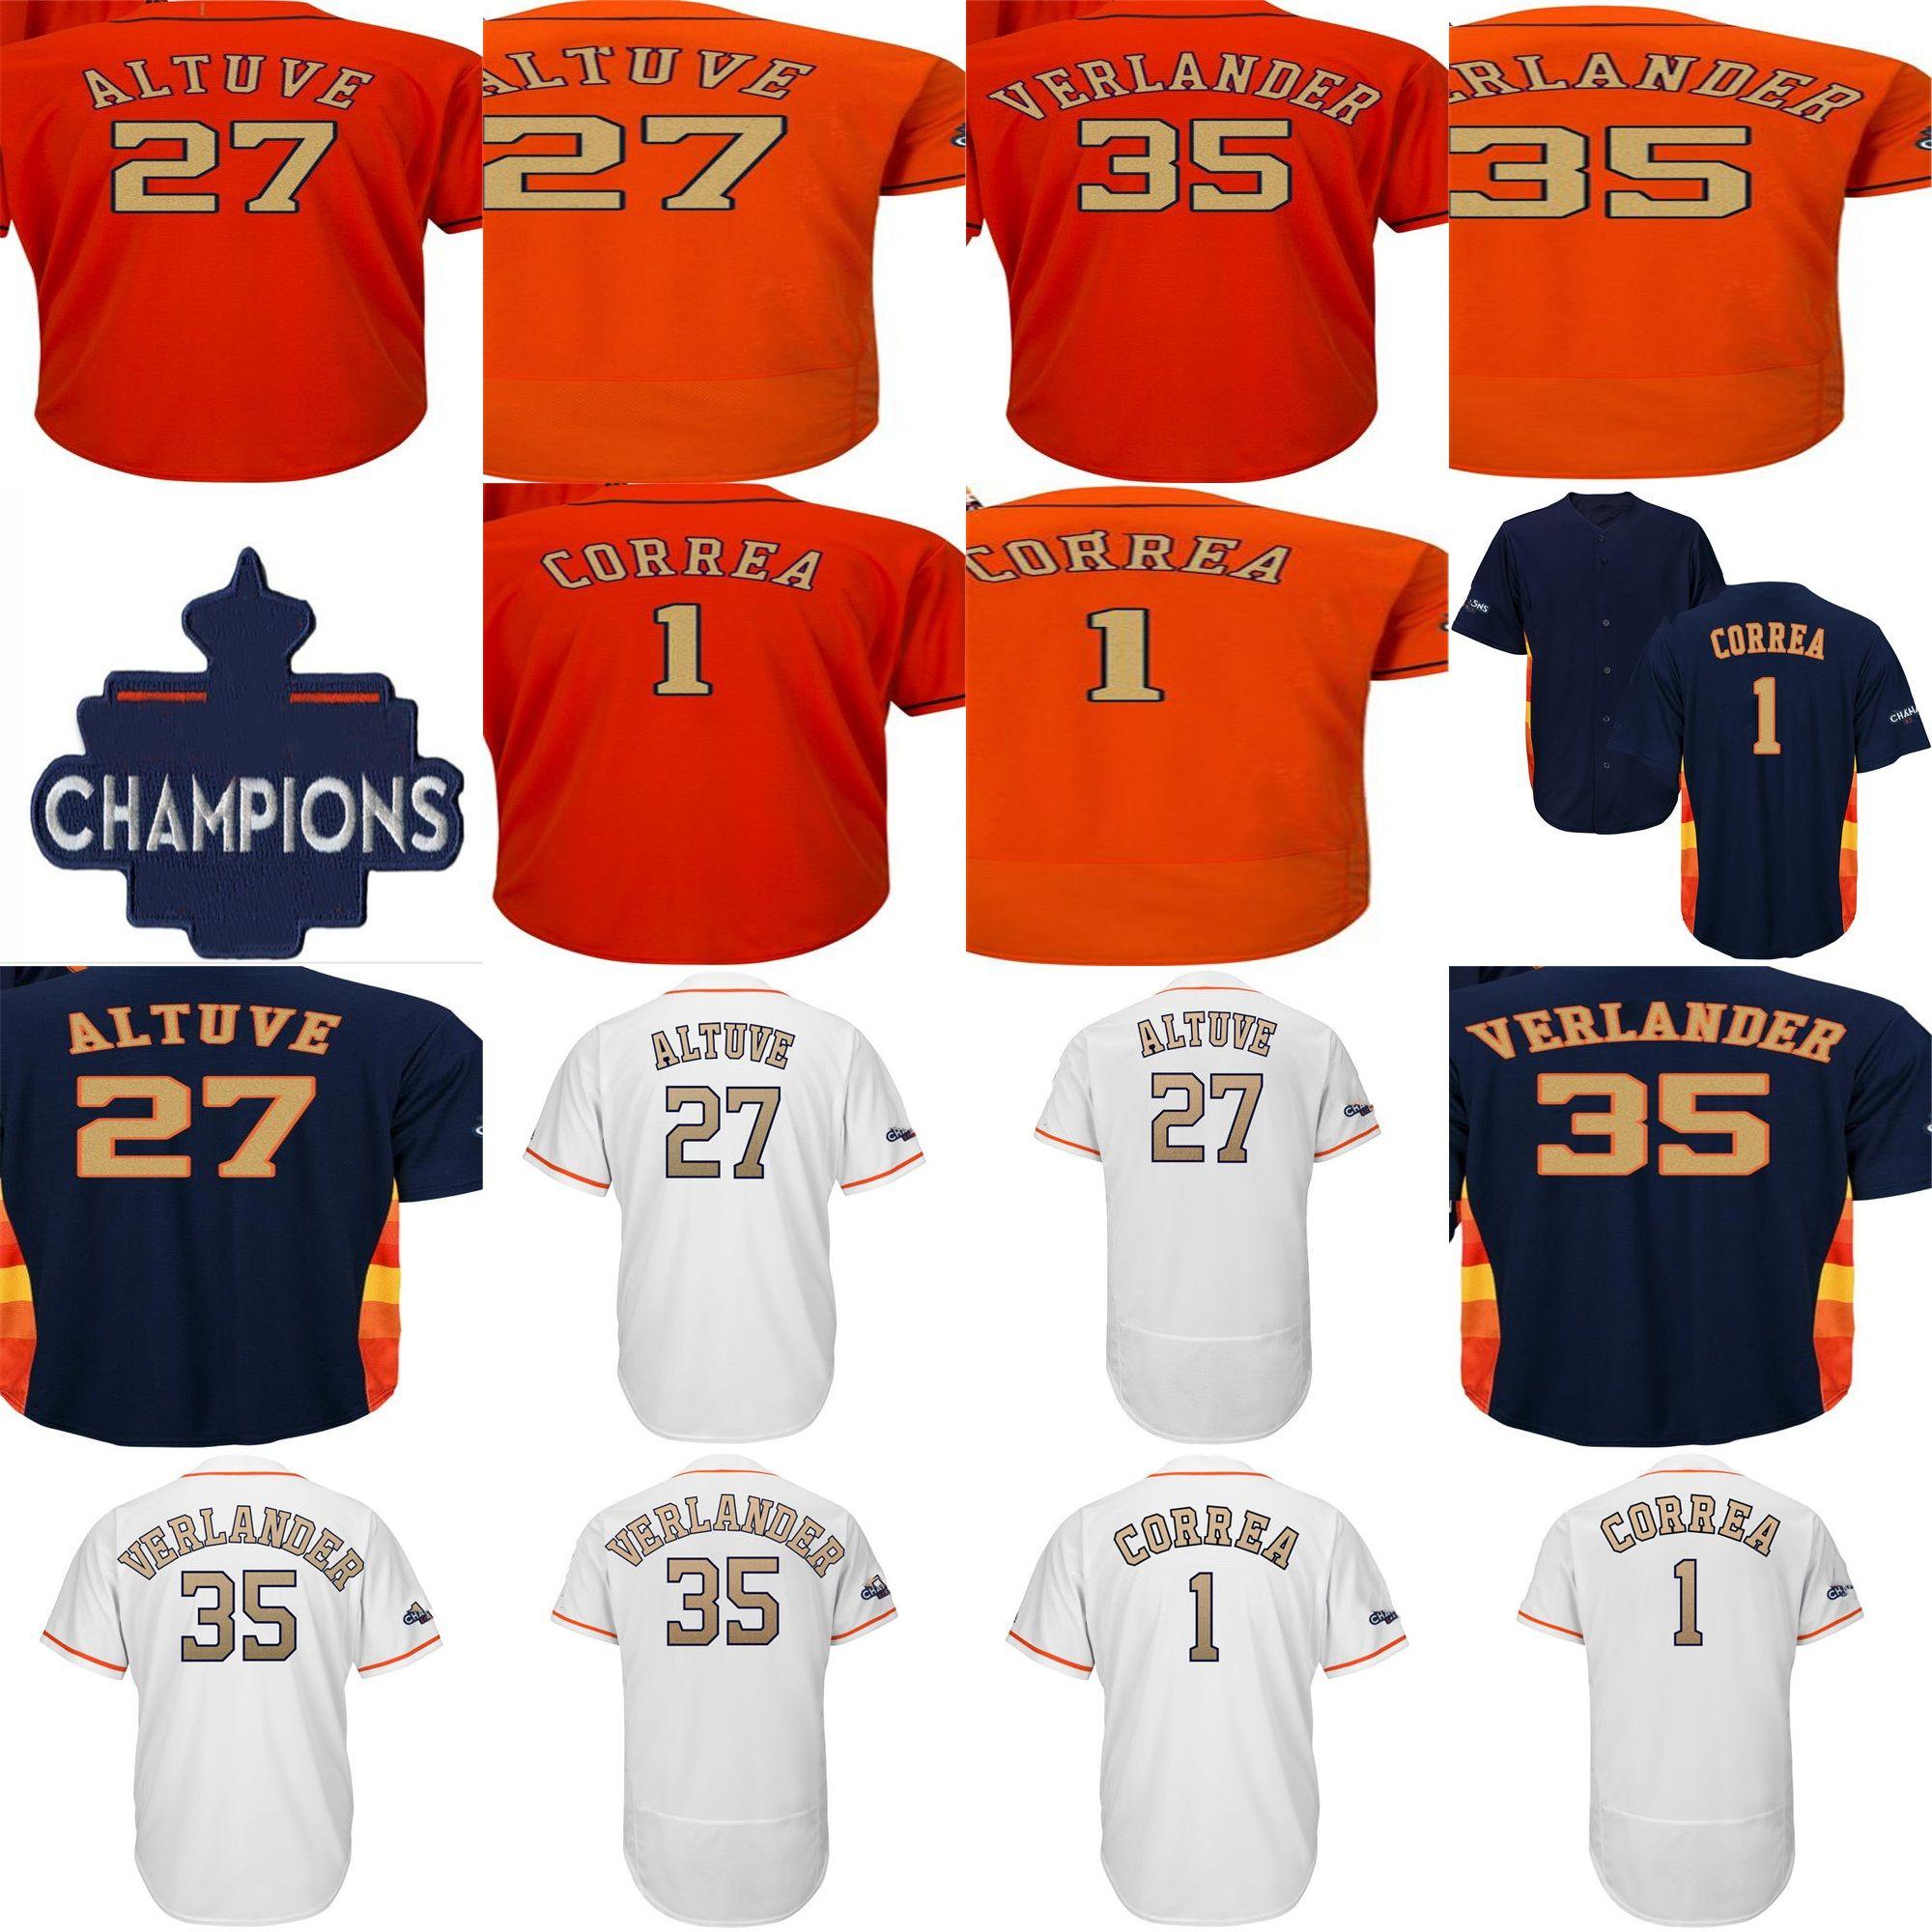 fa98cef3e Cheap 2018 Gold Program Carlos Correa 27 Jose Altuve 35 Justin Verlander  Men Lady Kids Houston 2017 WS Champion Patch Cool Flex Baseball Jerseys